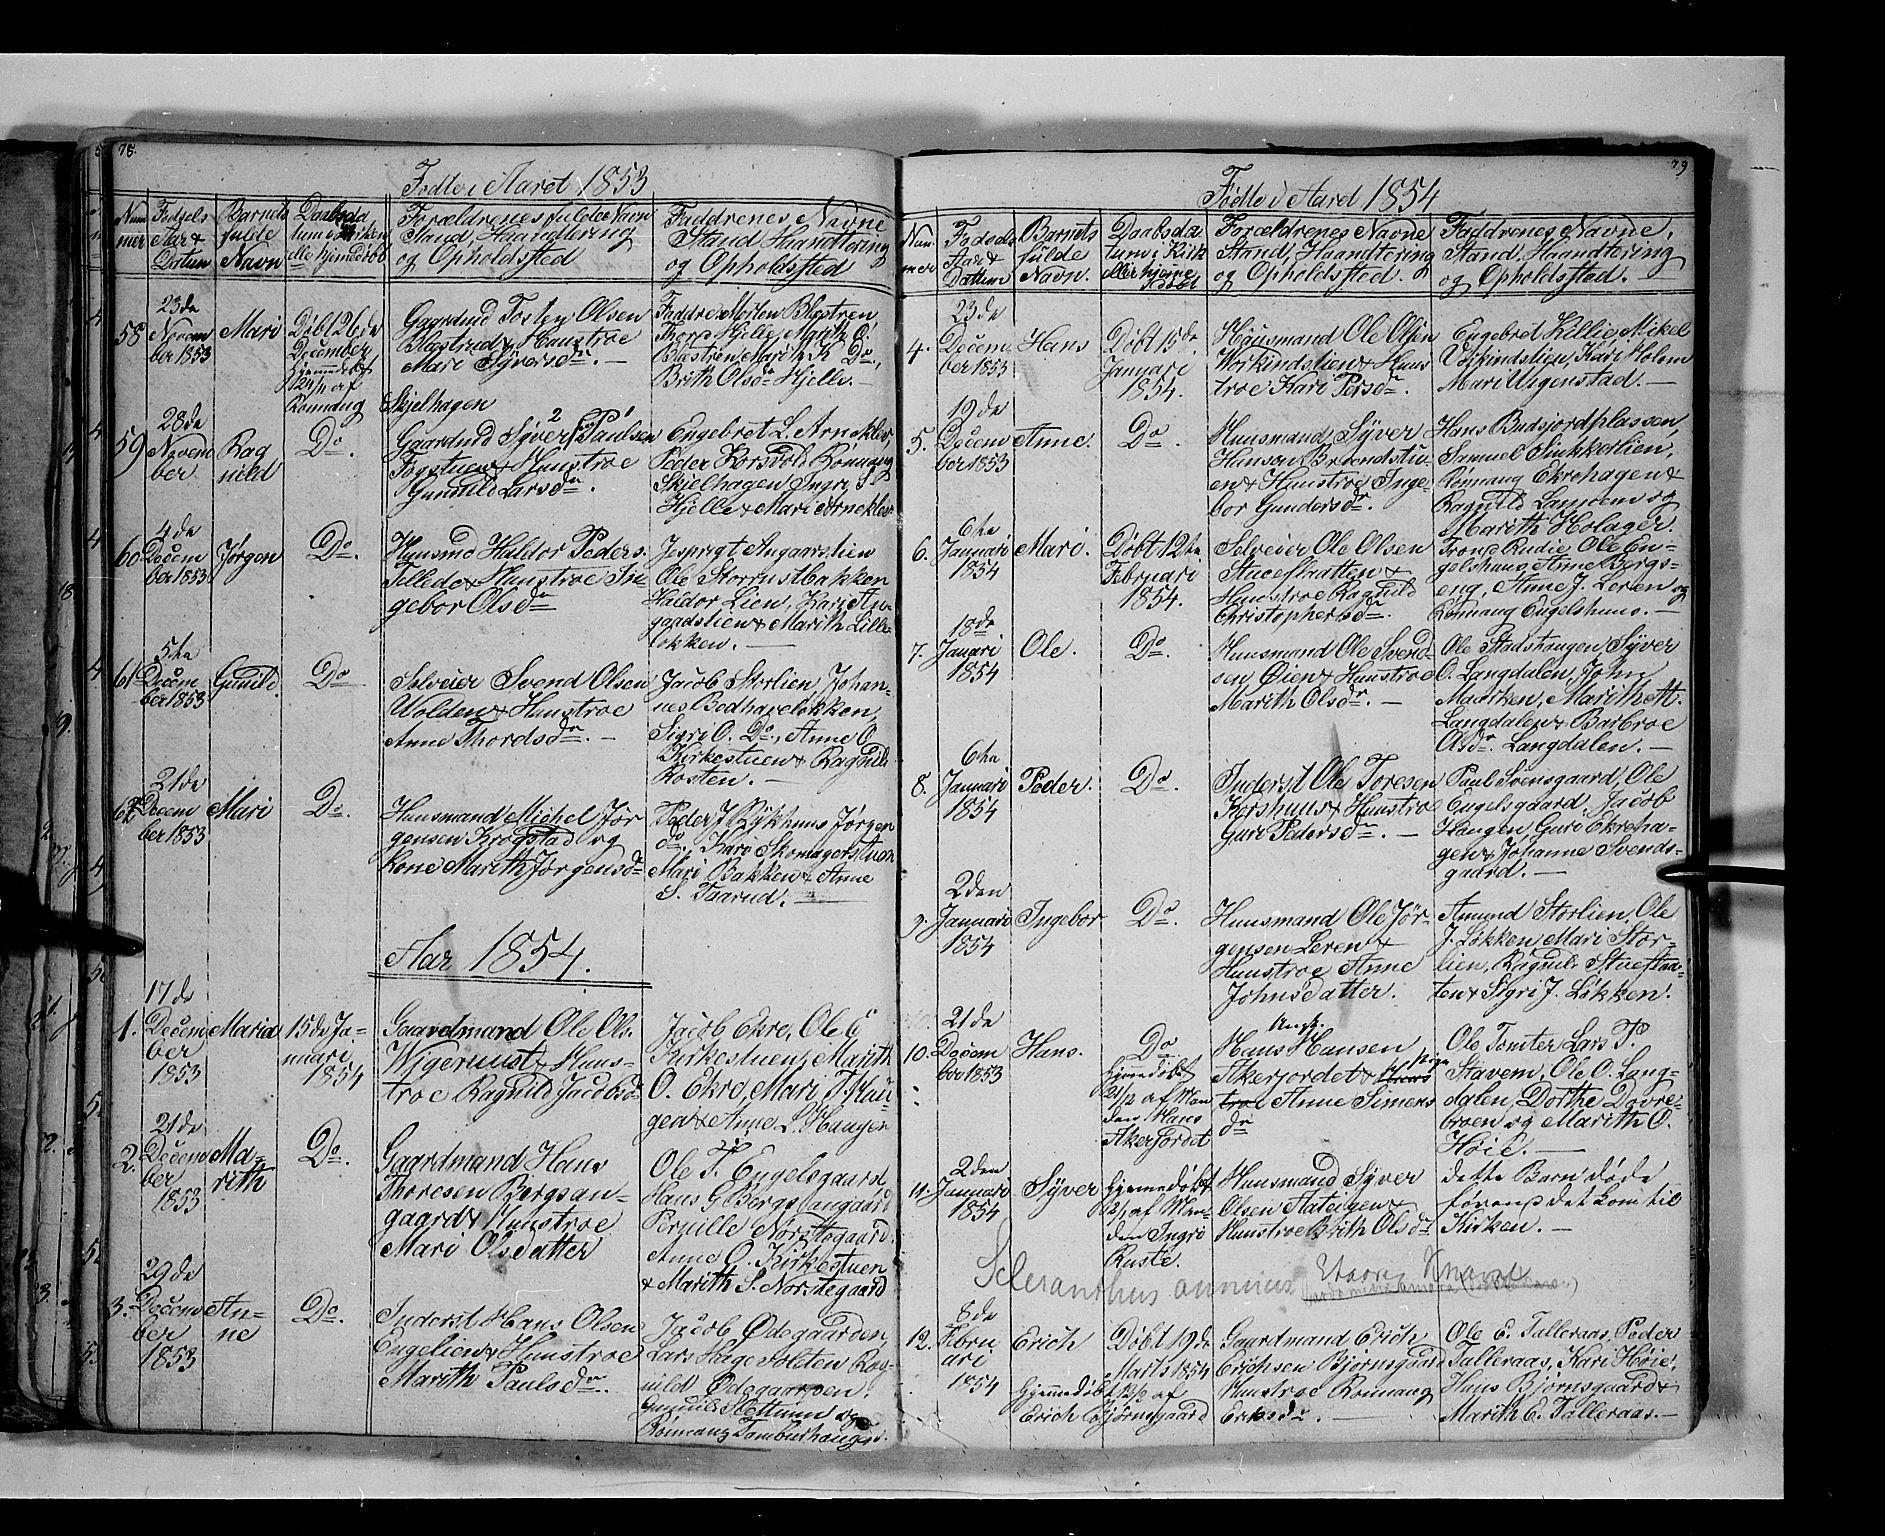 SAH, Lesja prestekontor, Klokkerbok nr. 3, 1842-1862, s. 78-79